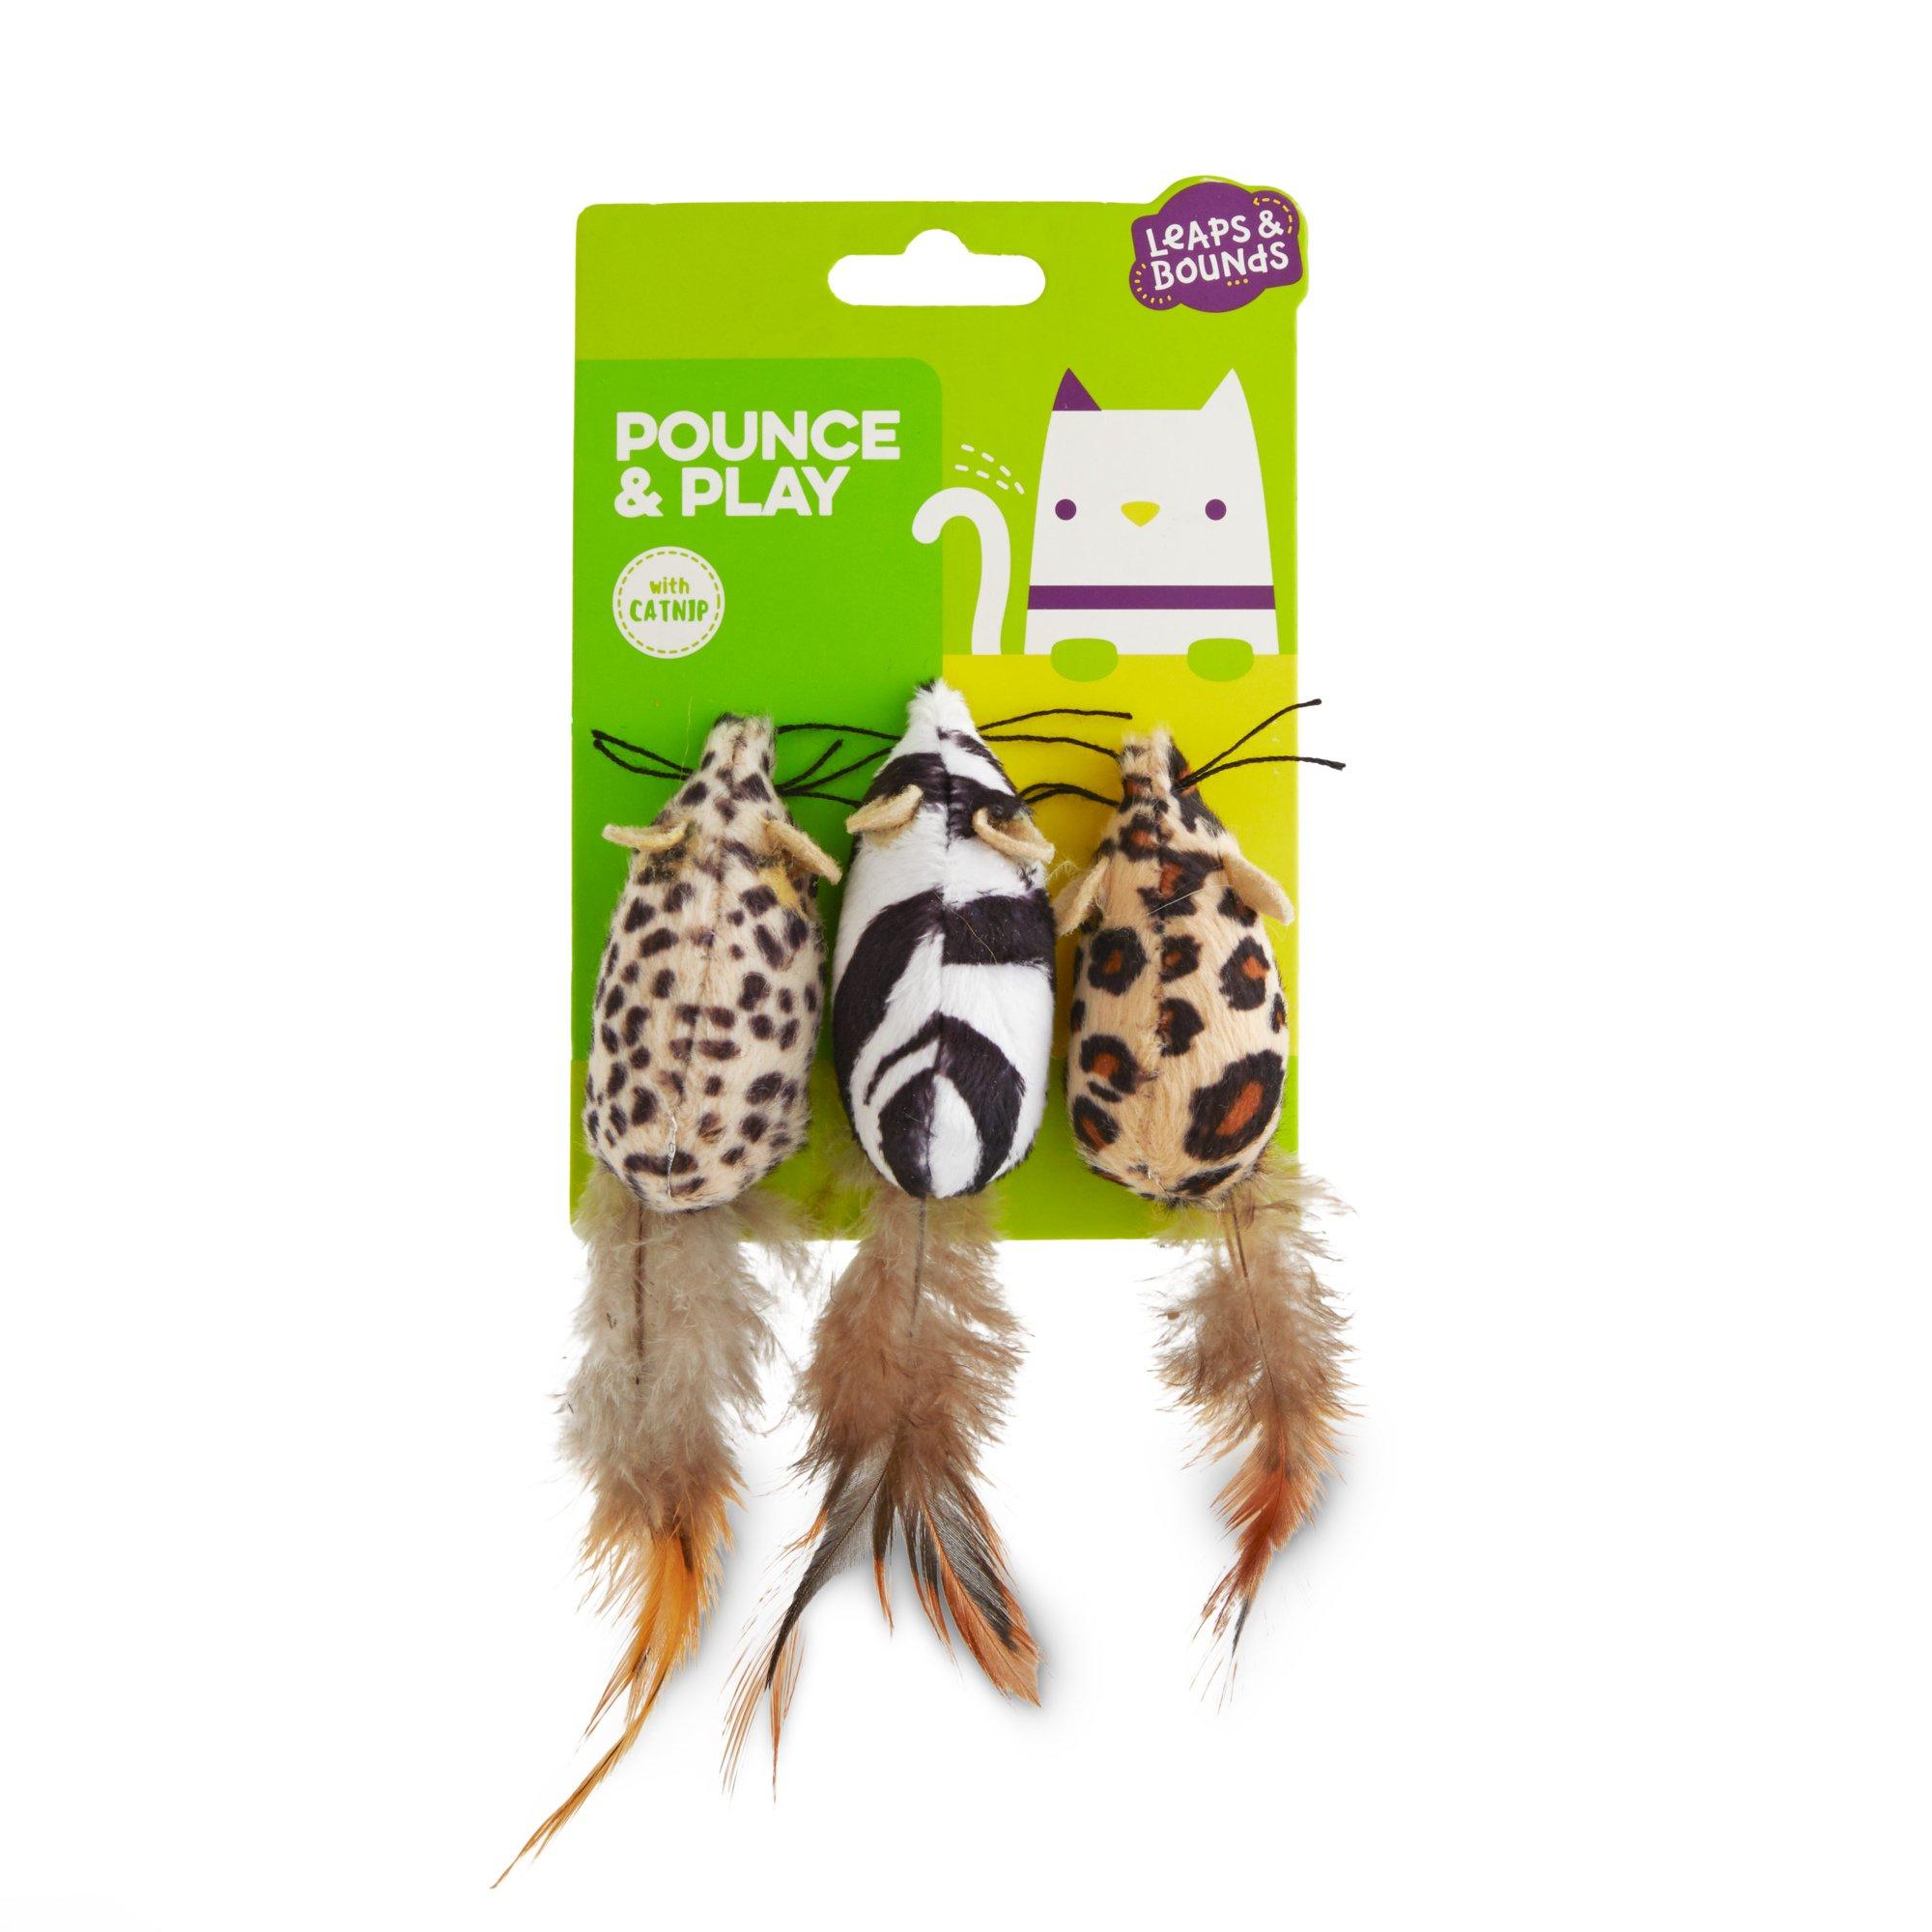 Leaps & Bounds Safari Mice Cat Toys with Catnip